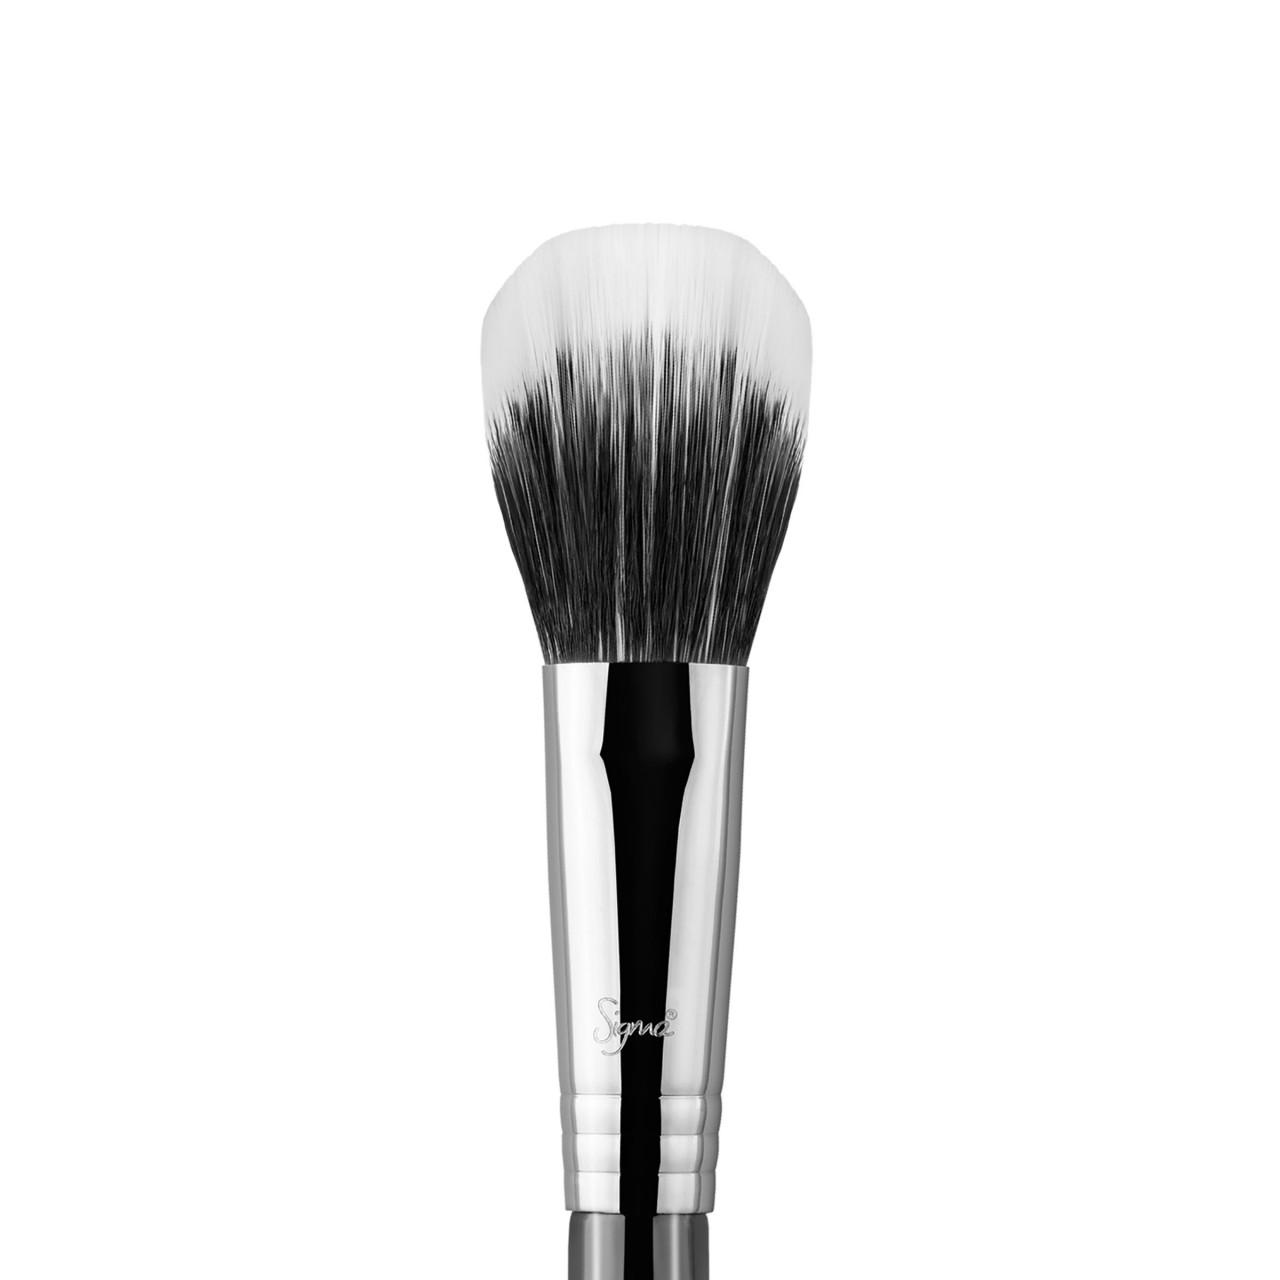 Sigma - Brushes F15 Duo Fibre Powder -